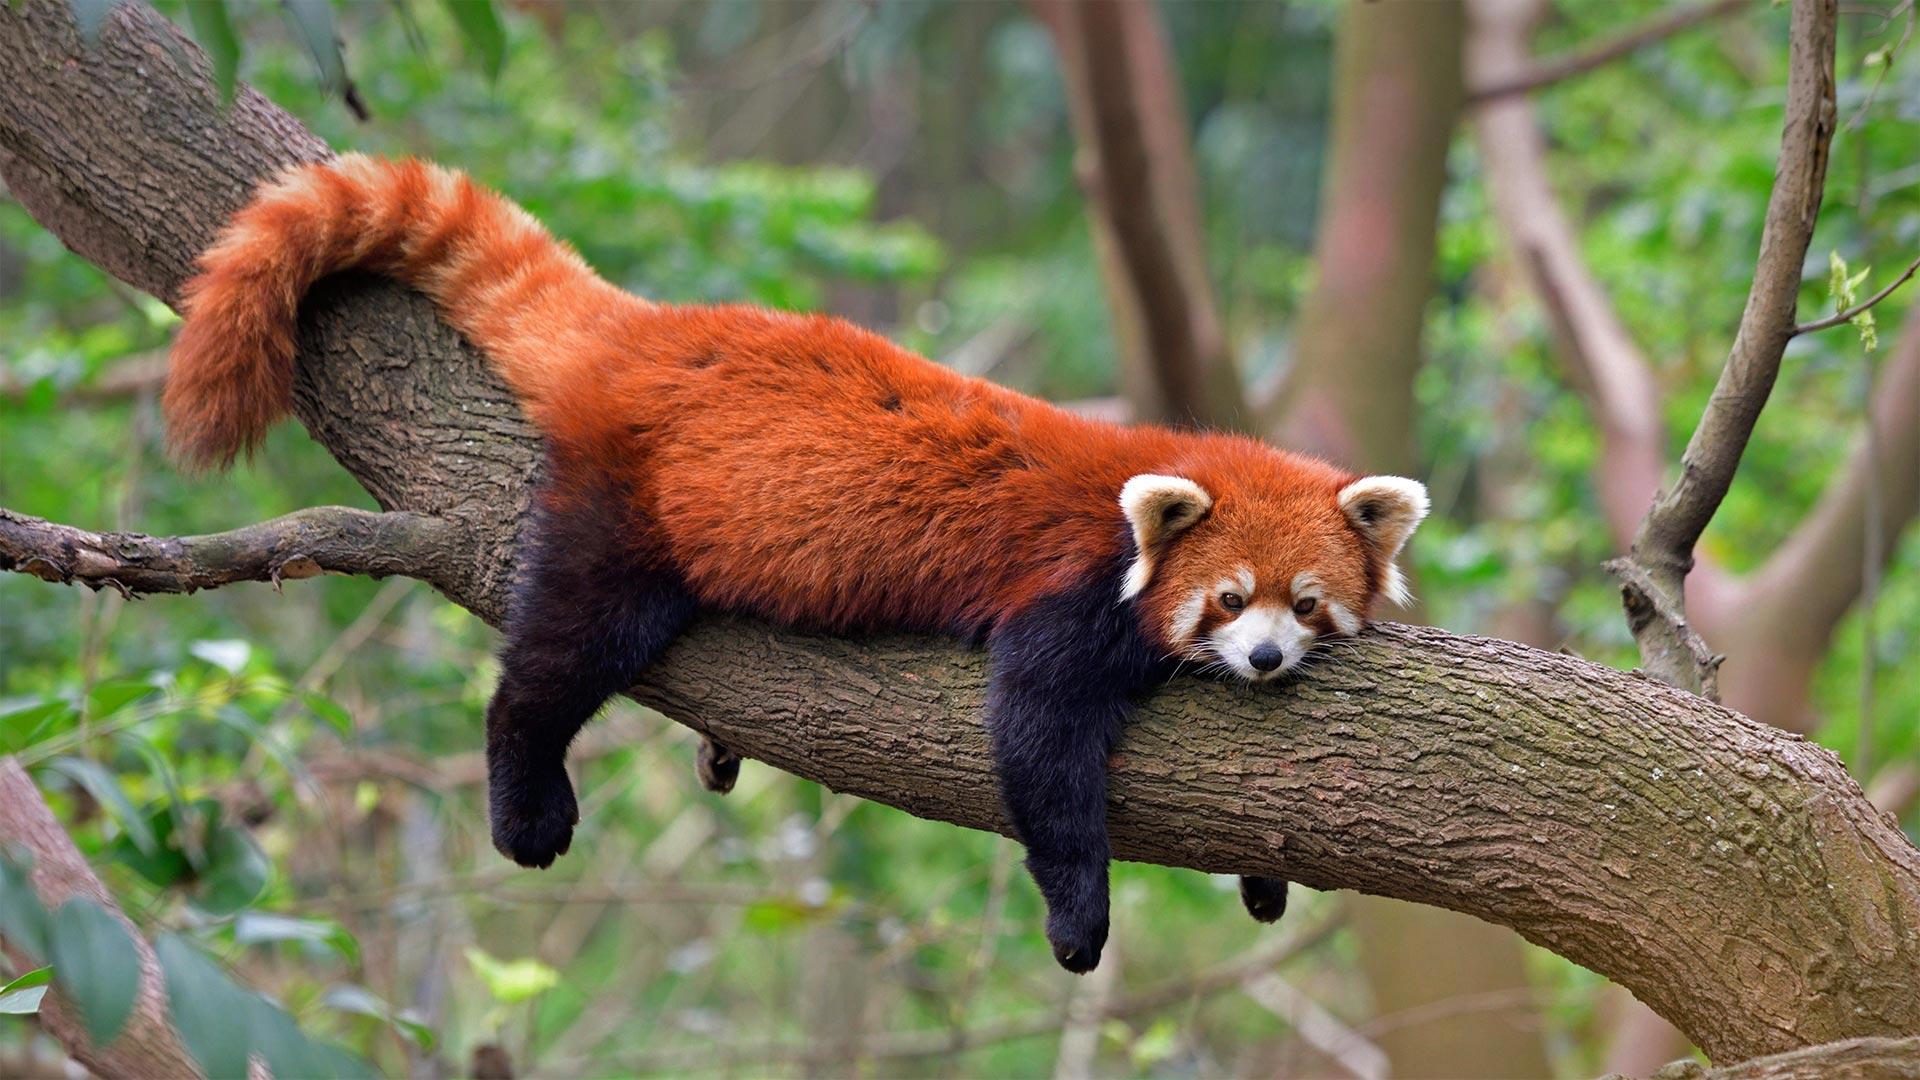 Firefox_ZH-CN0575885603